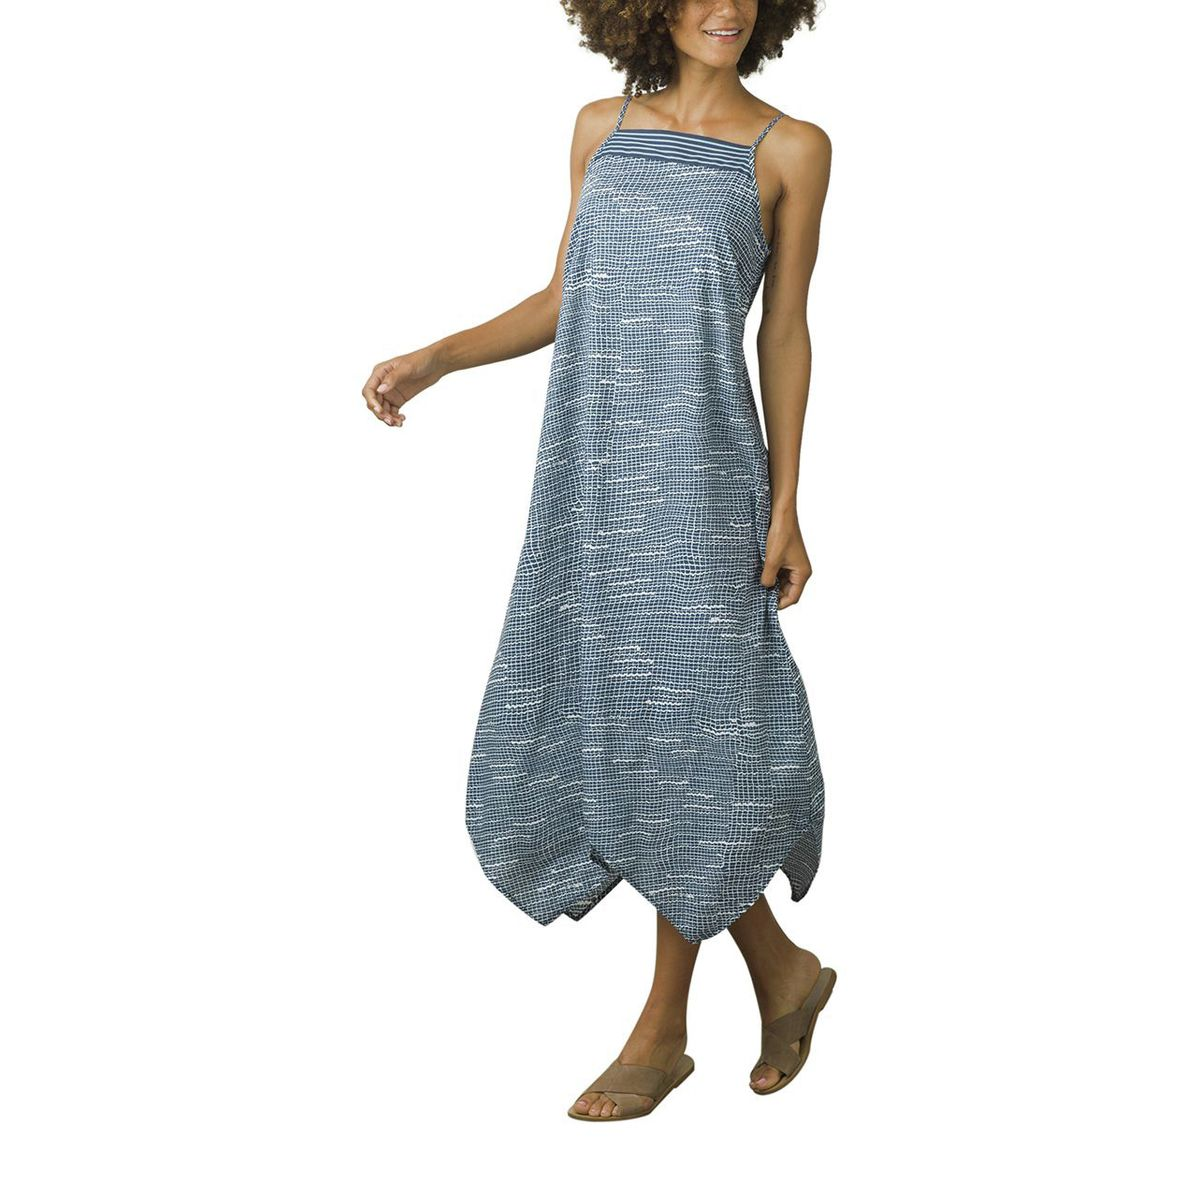 Prana Selene Tank Dress - Women's Blue Thatch, L PRA016Q-BLTHA-L